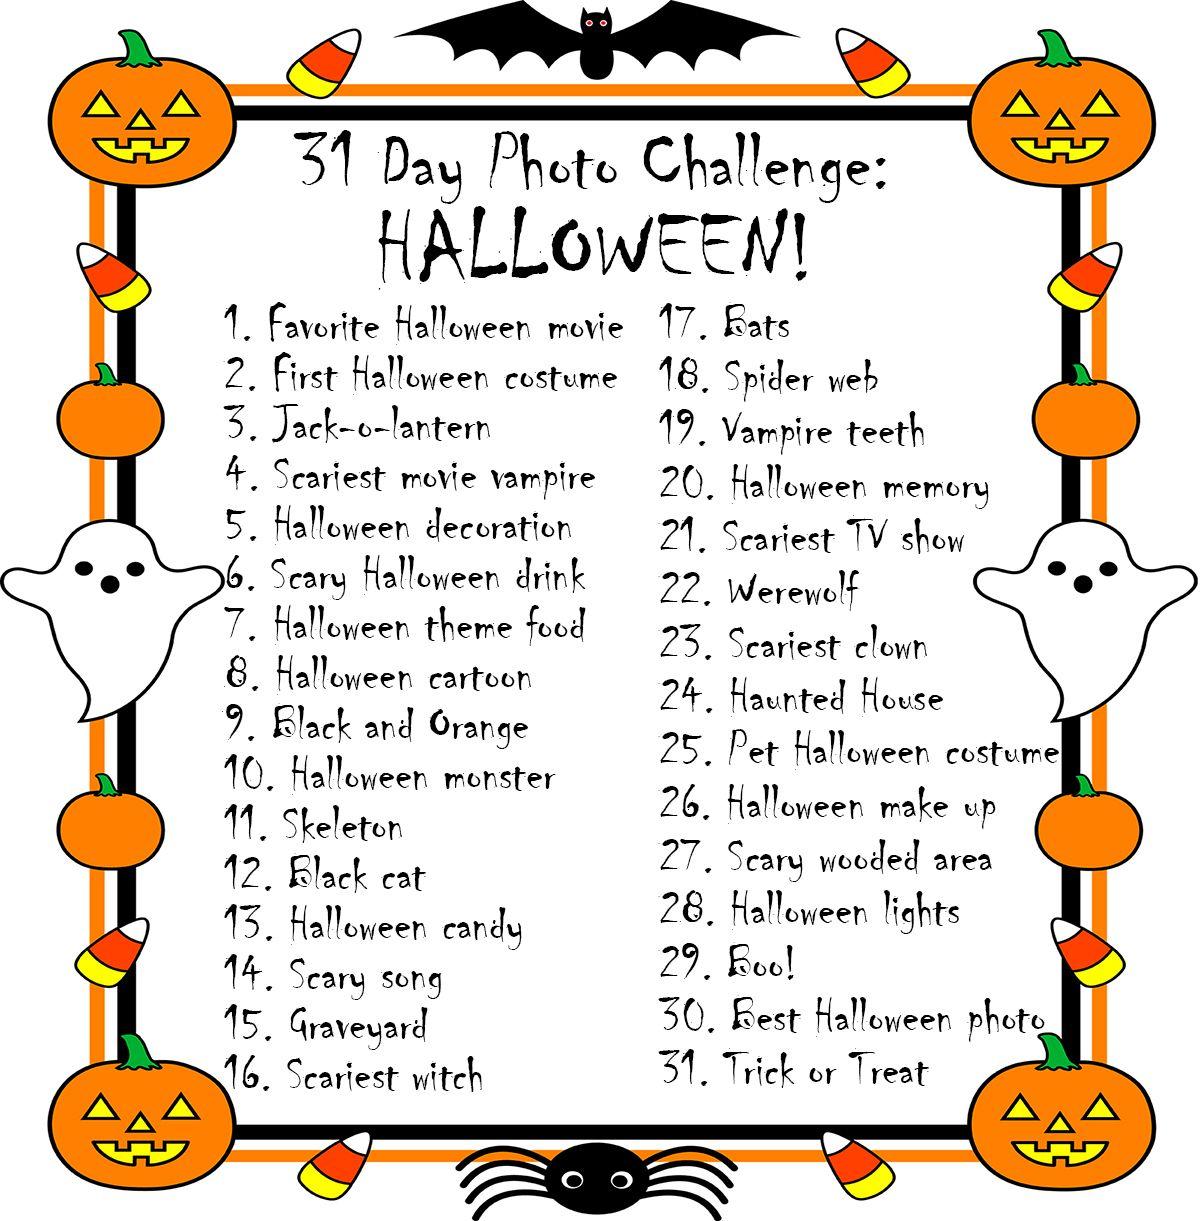 31 Day Photo Challenge Halloween